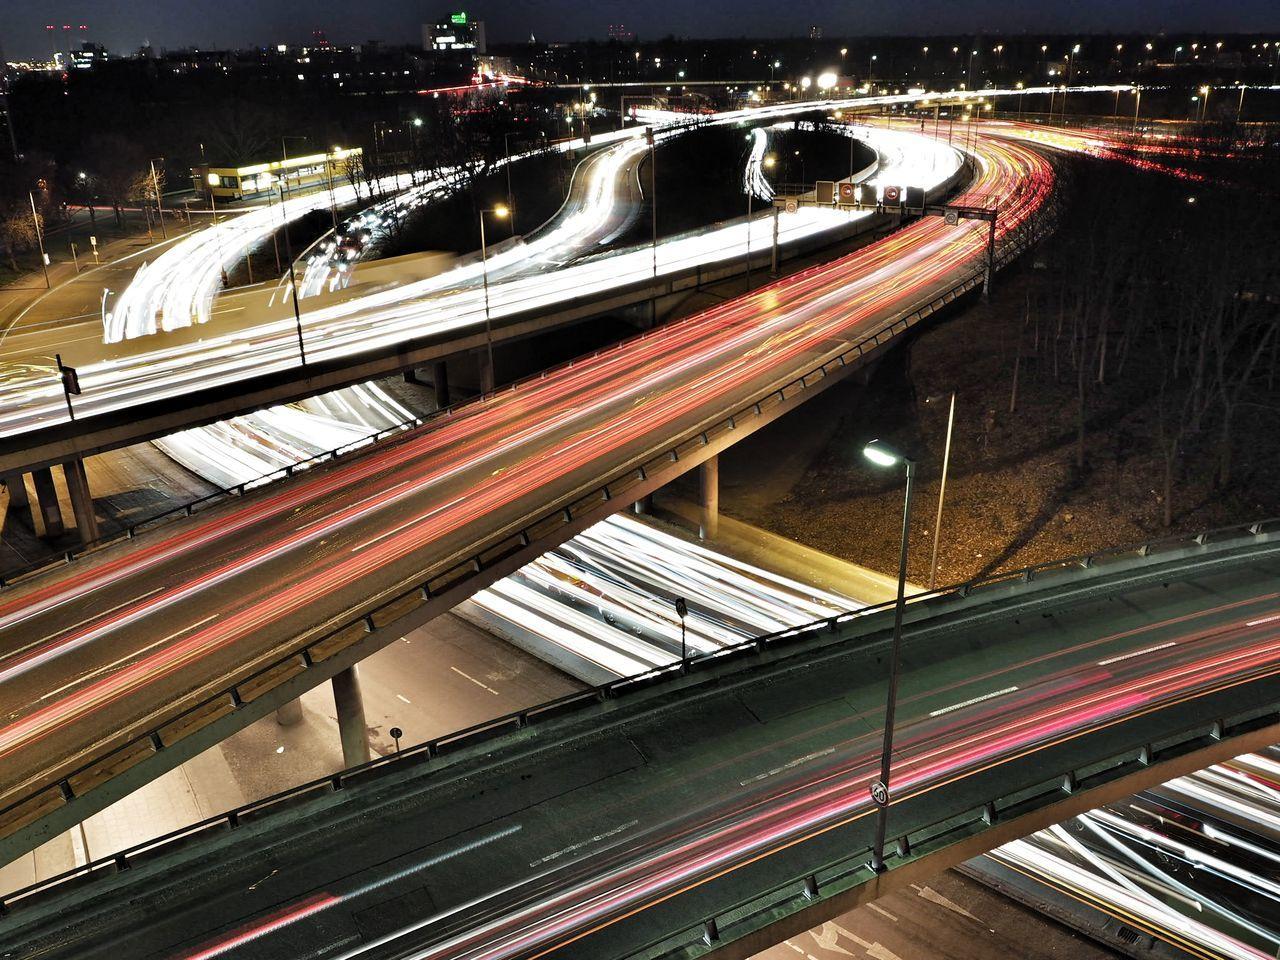 Flowing like a river - Autobahn in Berlin Transportation High Angle View Night Traffic Illuminated City Outdoors Cars Motorway Crossing Highway Loop Lightflow Longexposure Berlin ICC EyeEmNewHere